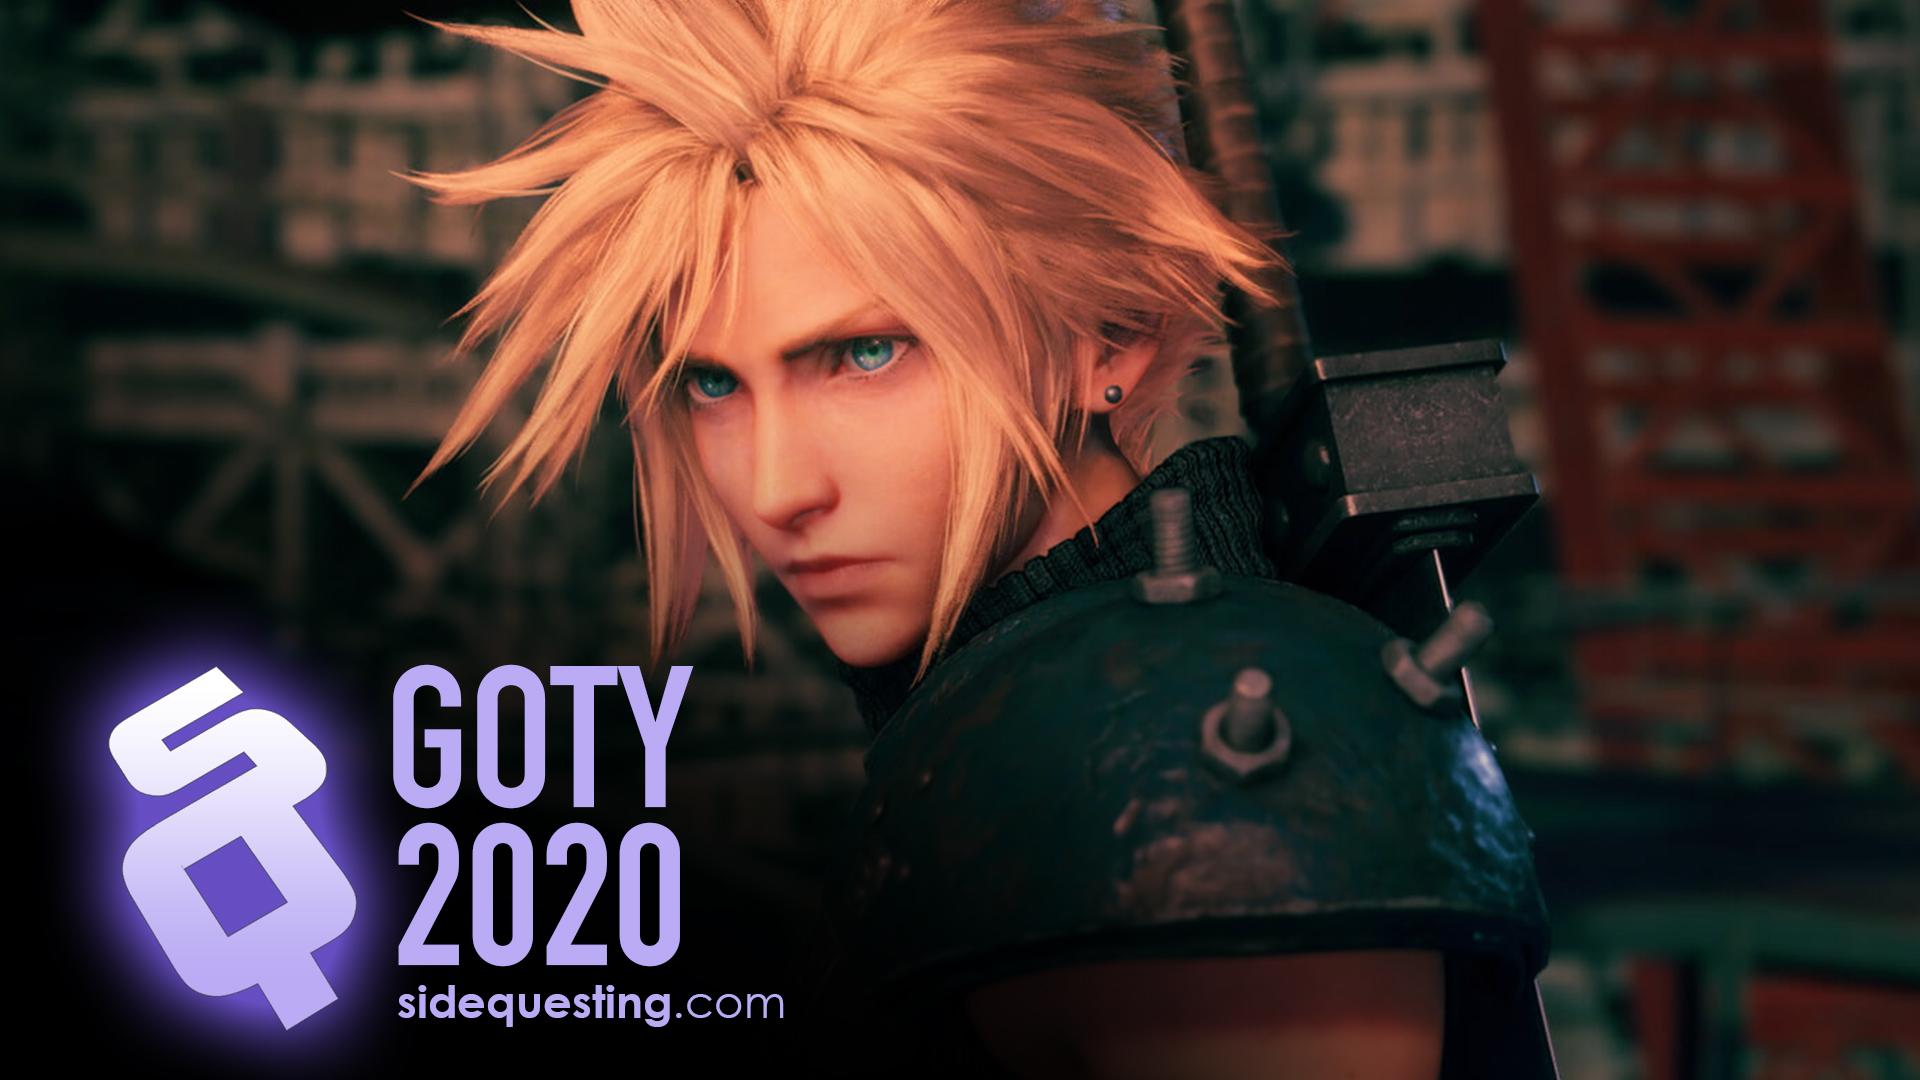 SideQuesting's GOTY 2020: Final Fantasy VII Remake